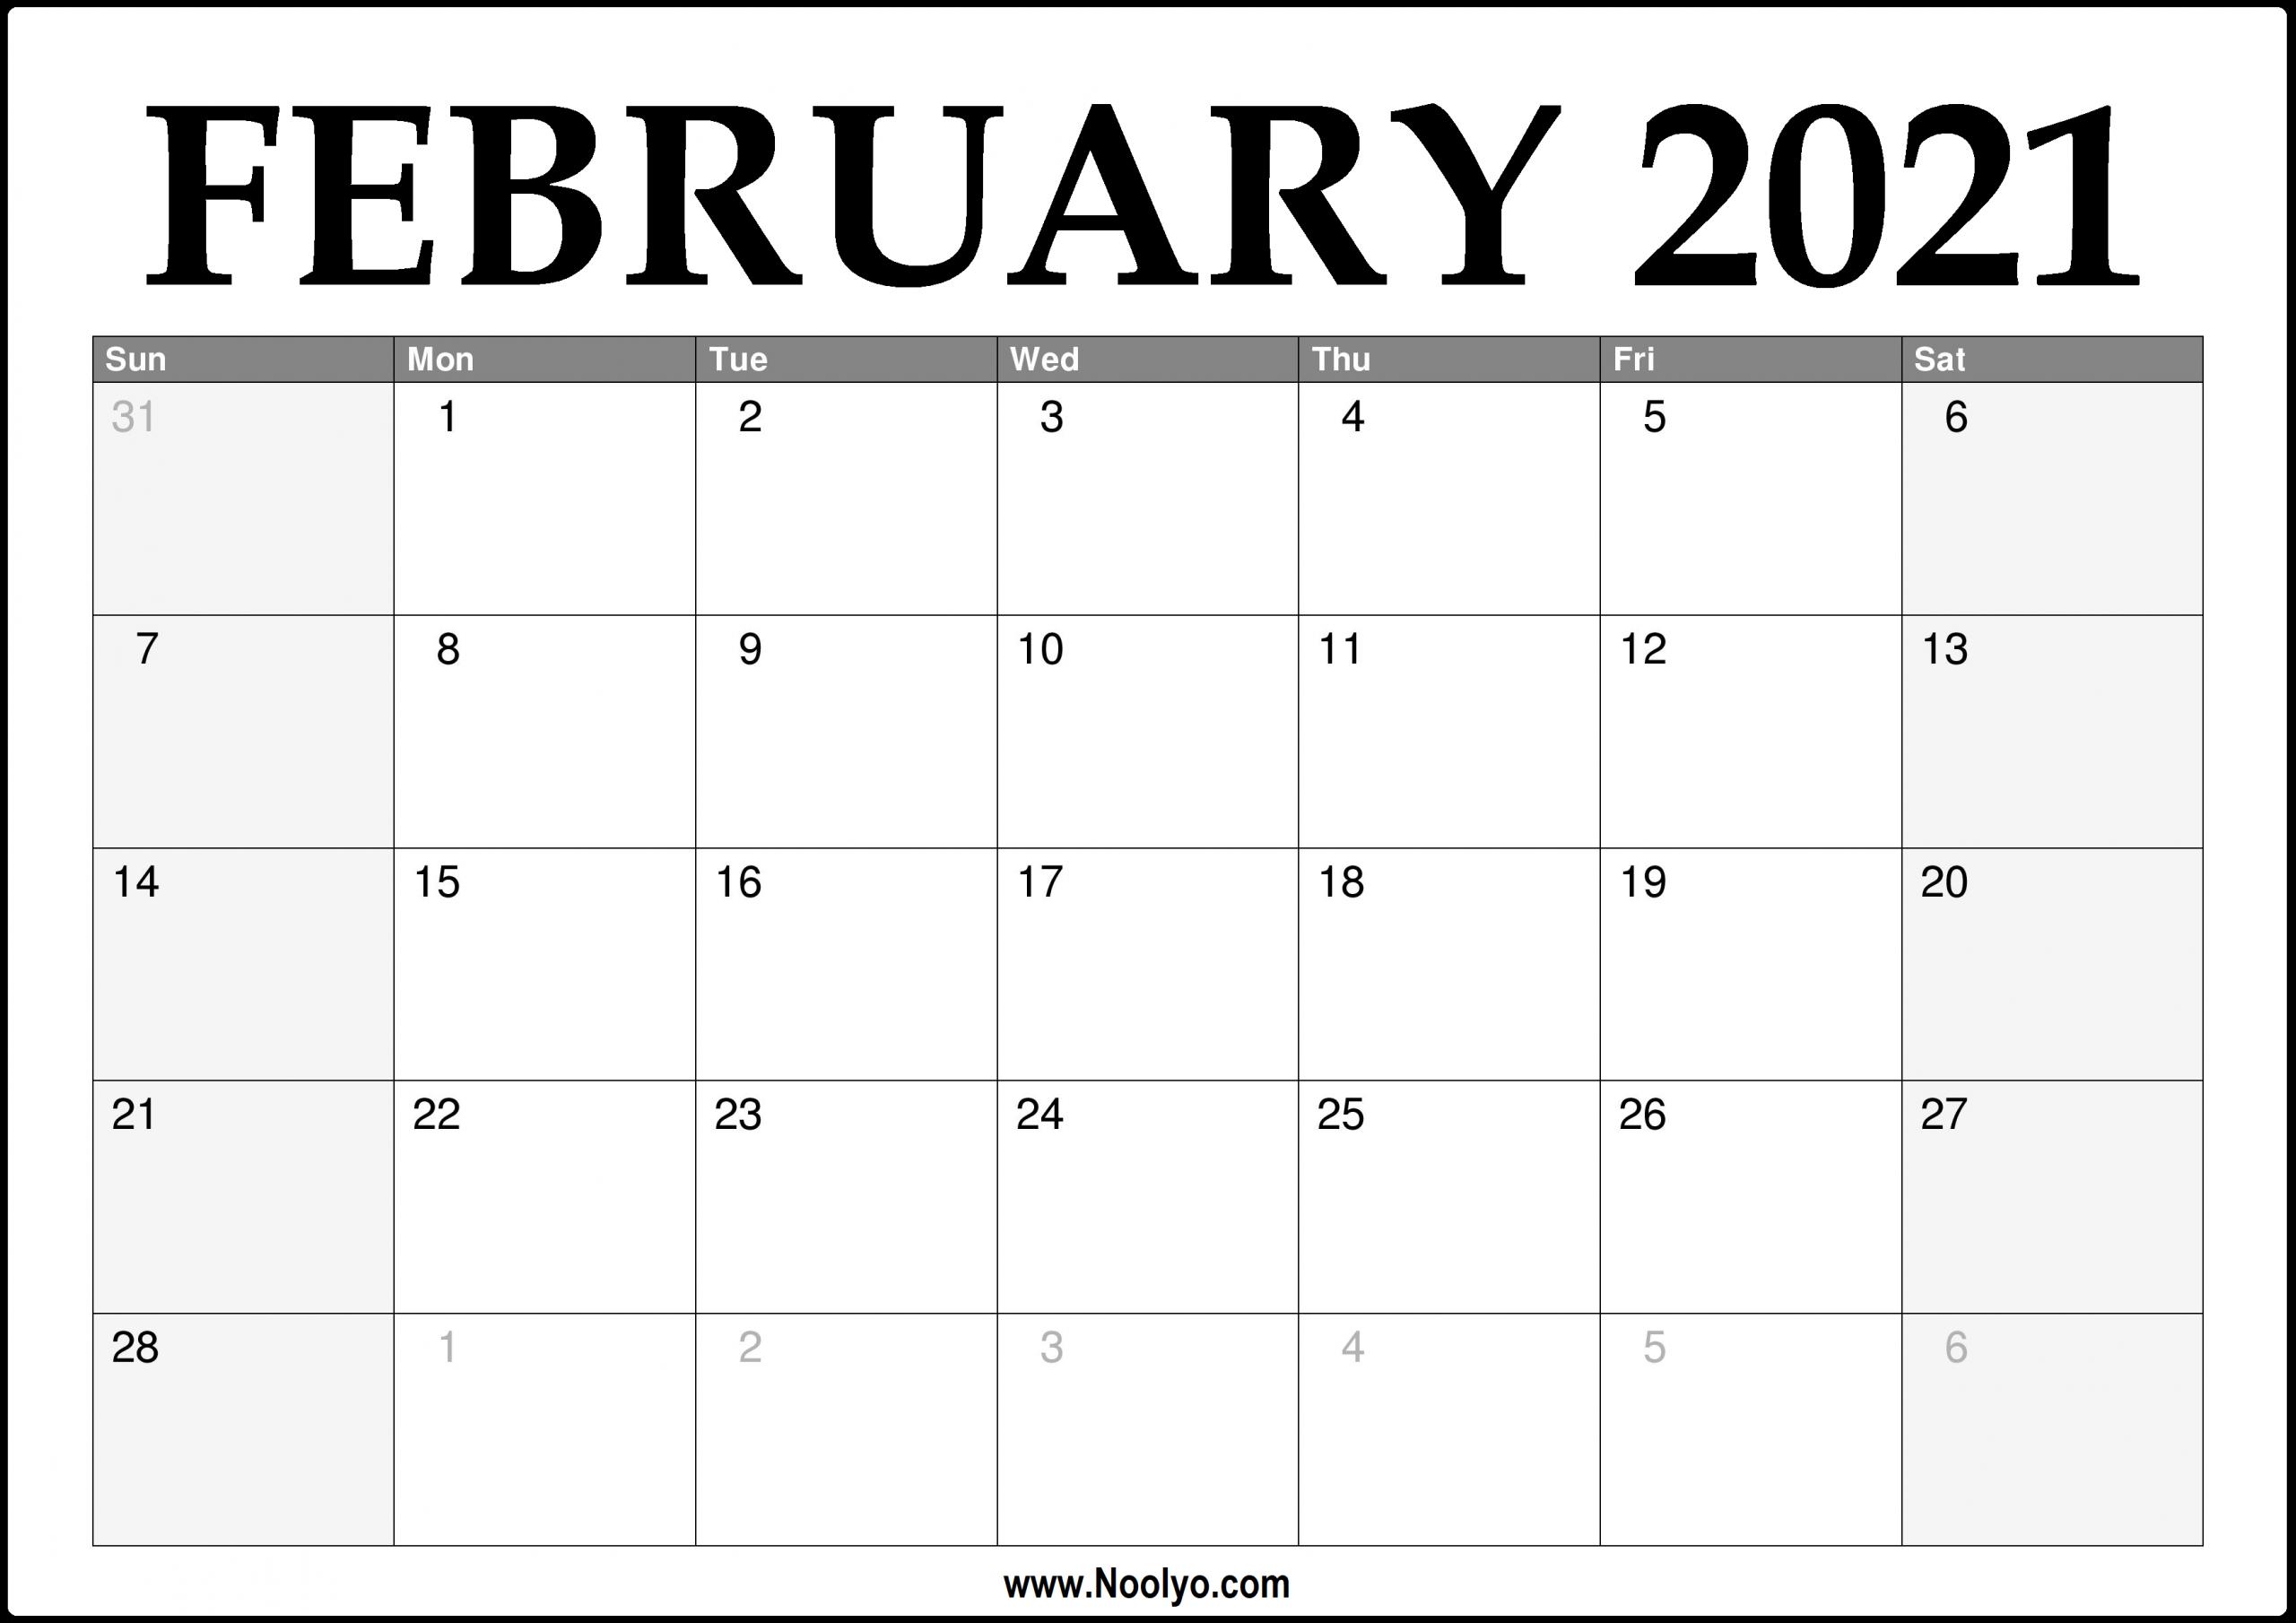 2021 February Calendar Printable Download Free Noolyo